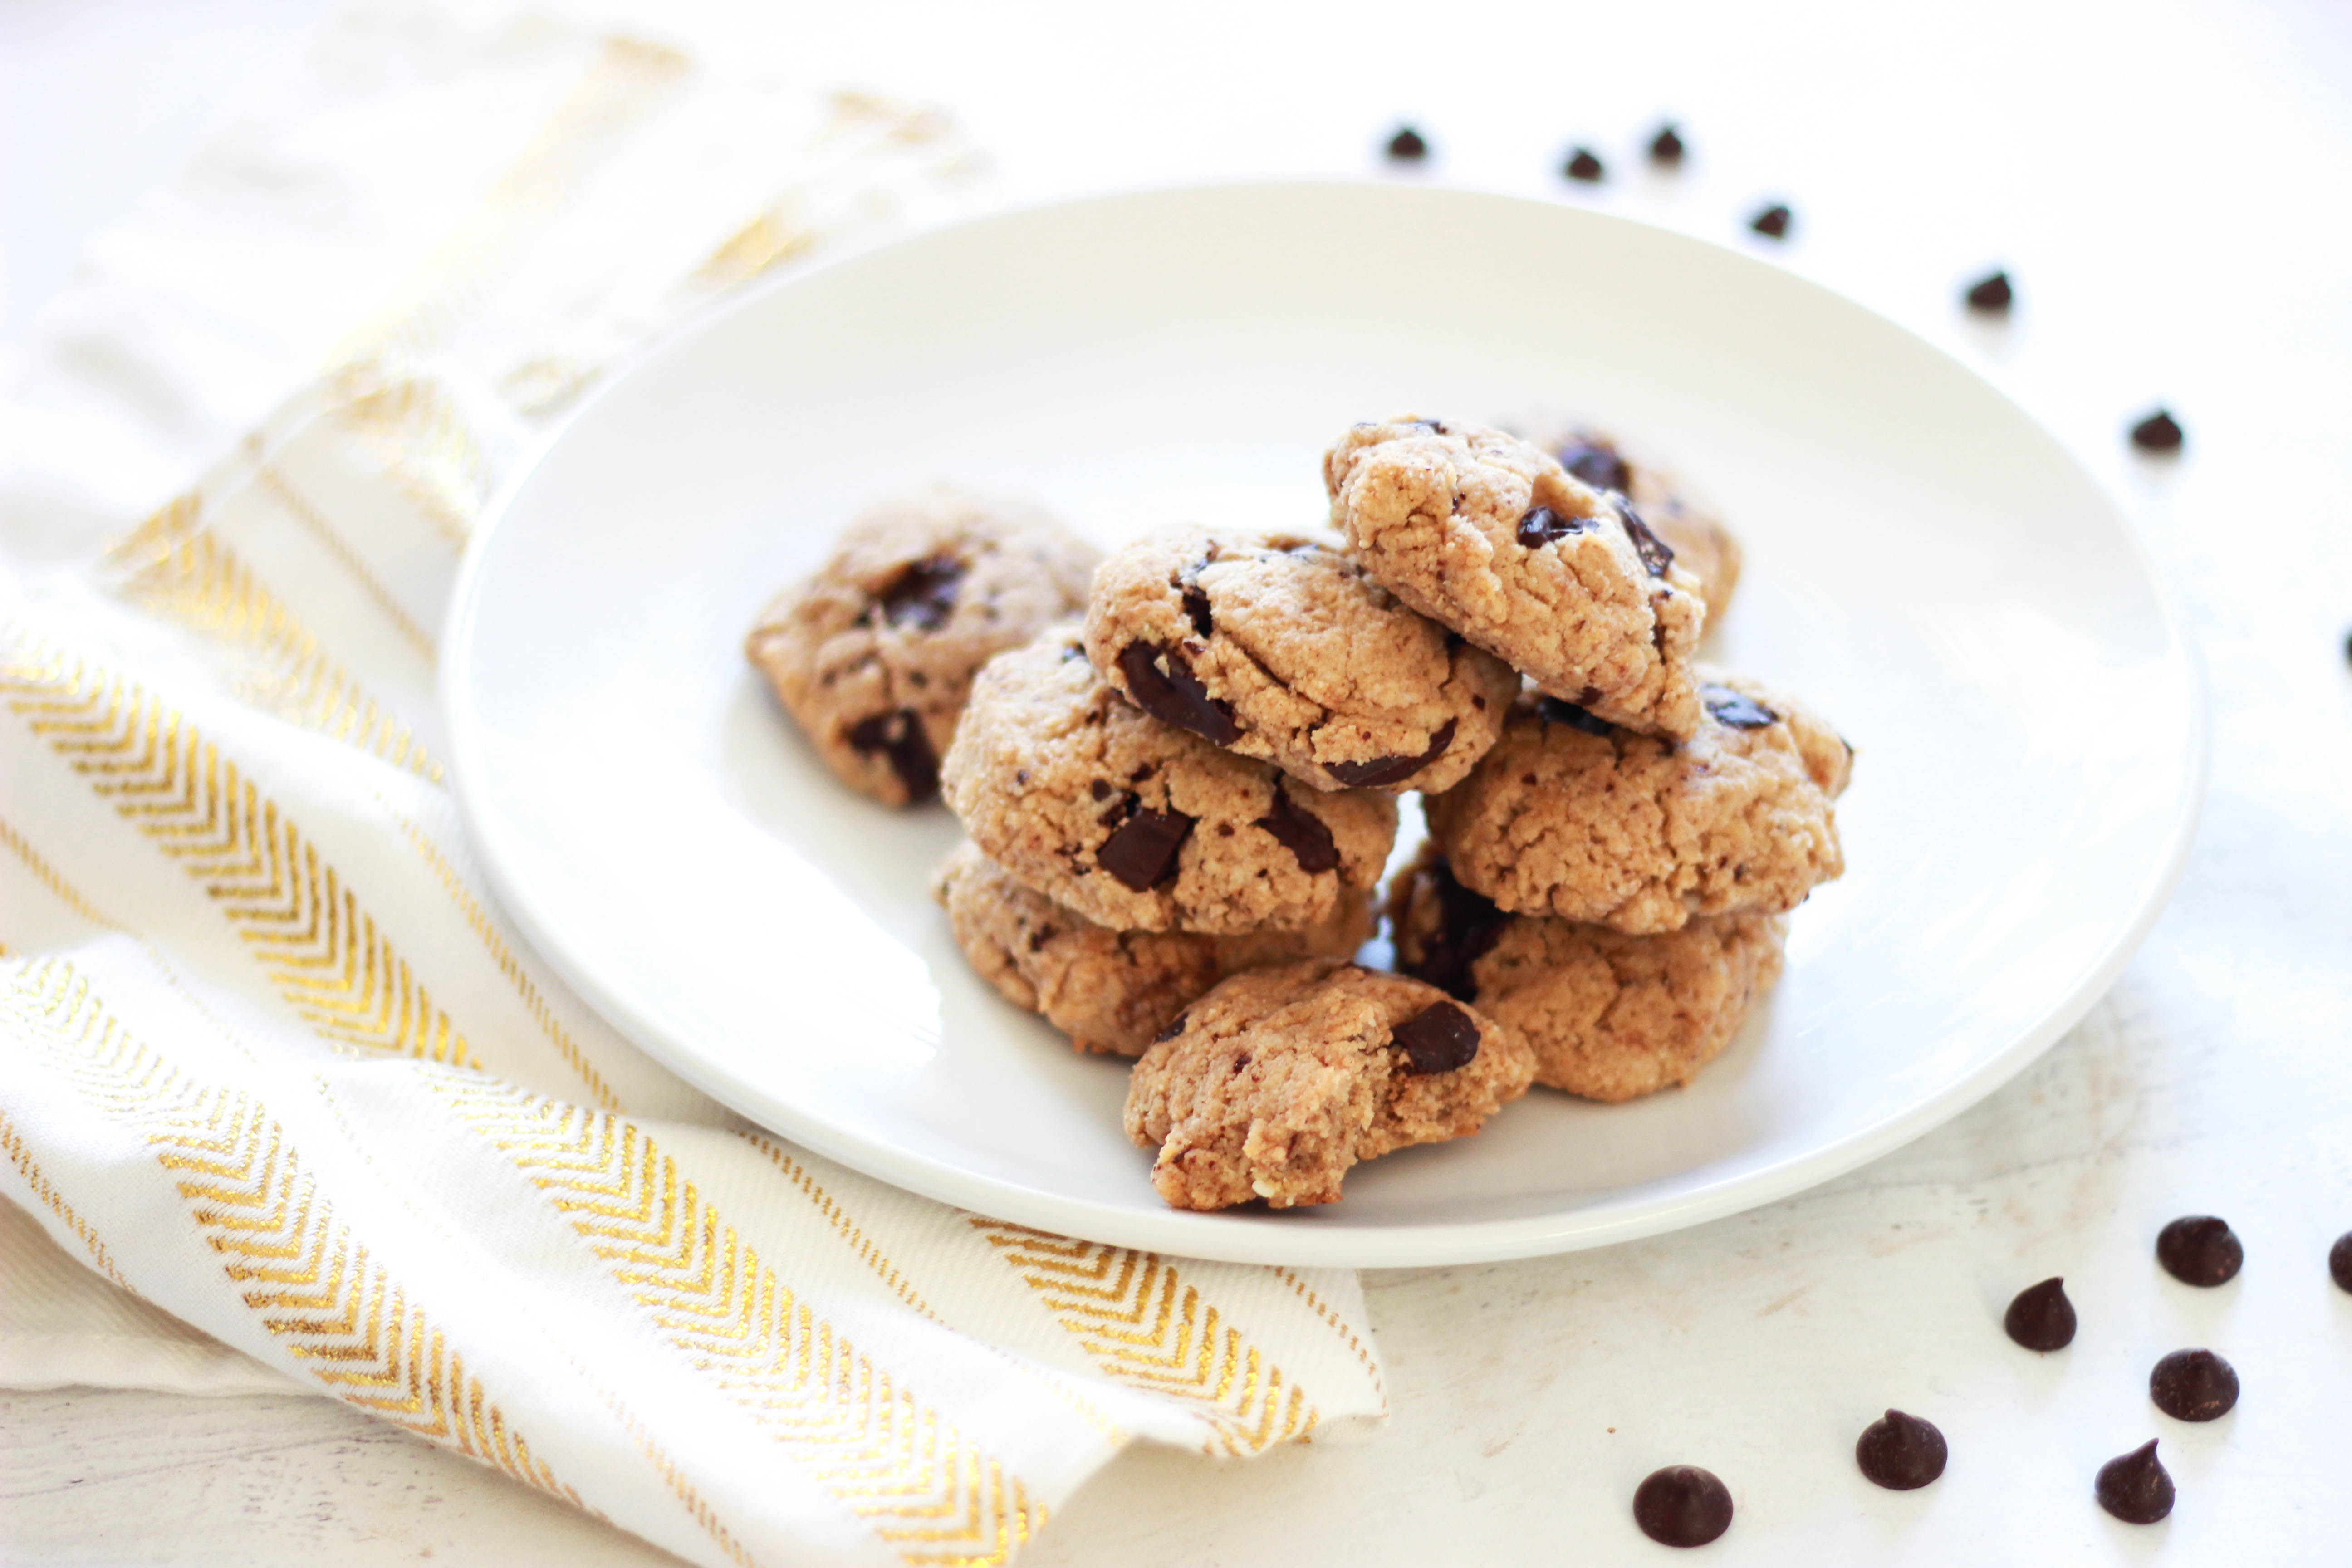 Sugar-Free / Paleo / Keto Chocolate Chip Cookies